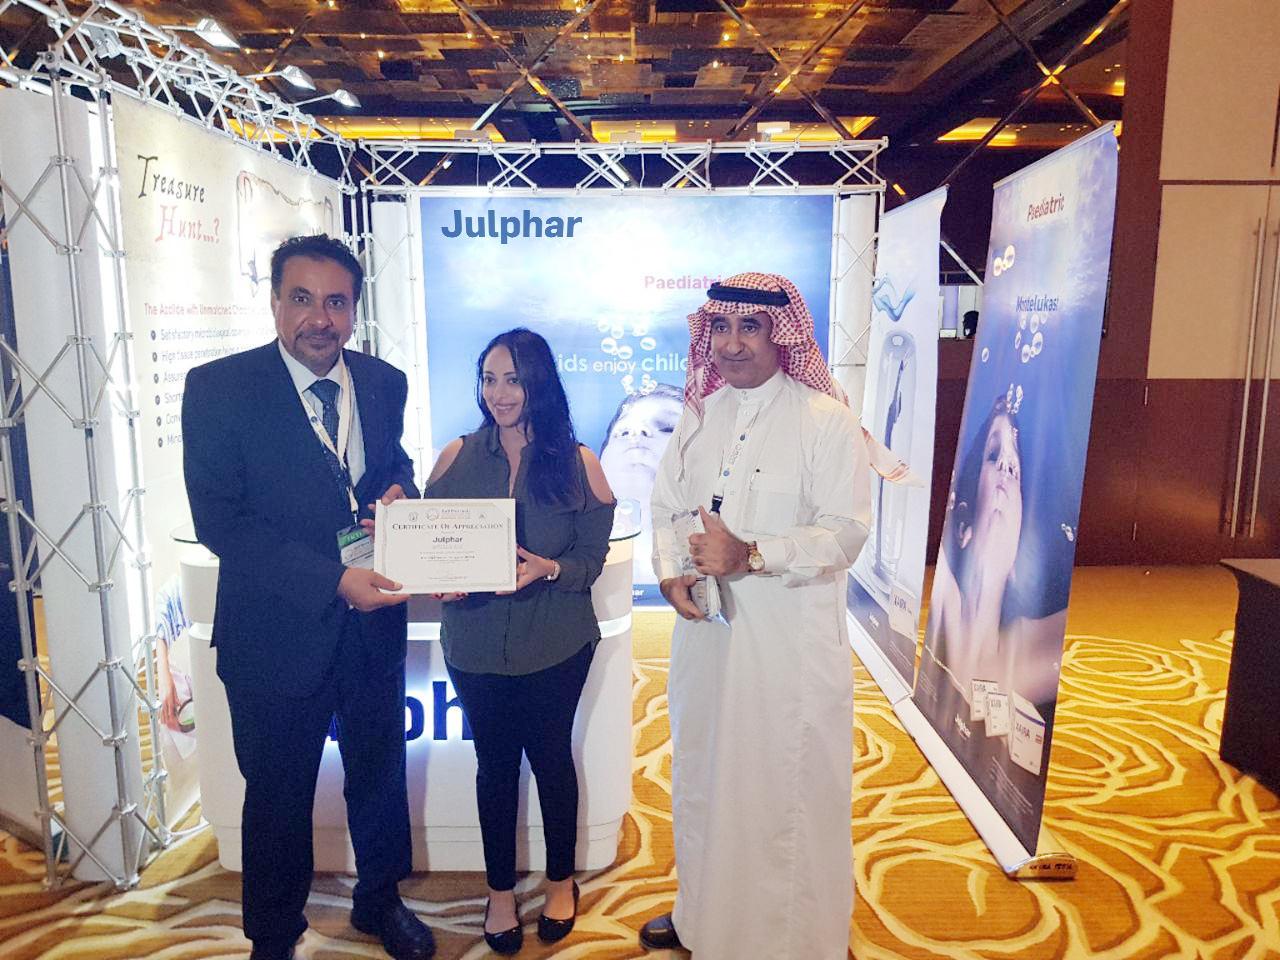 Julphar General Medicine Participates at Gulf Thoracic Congress